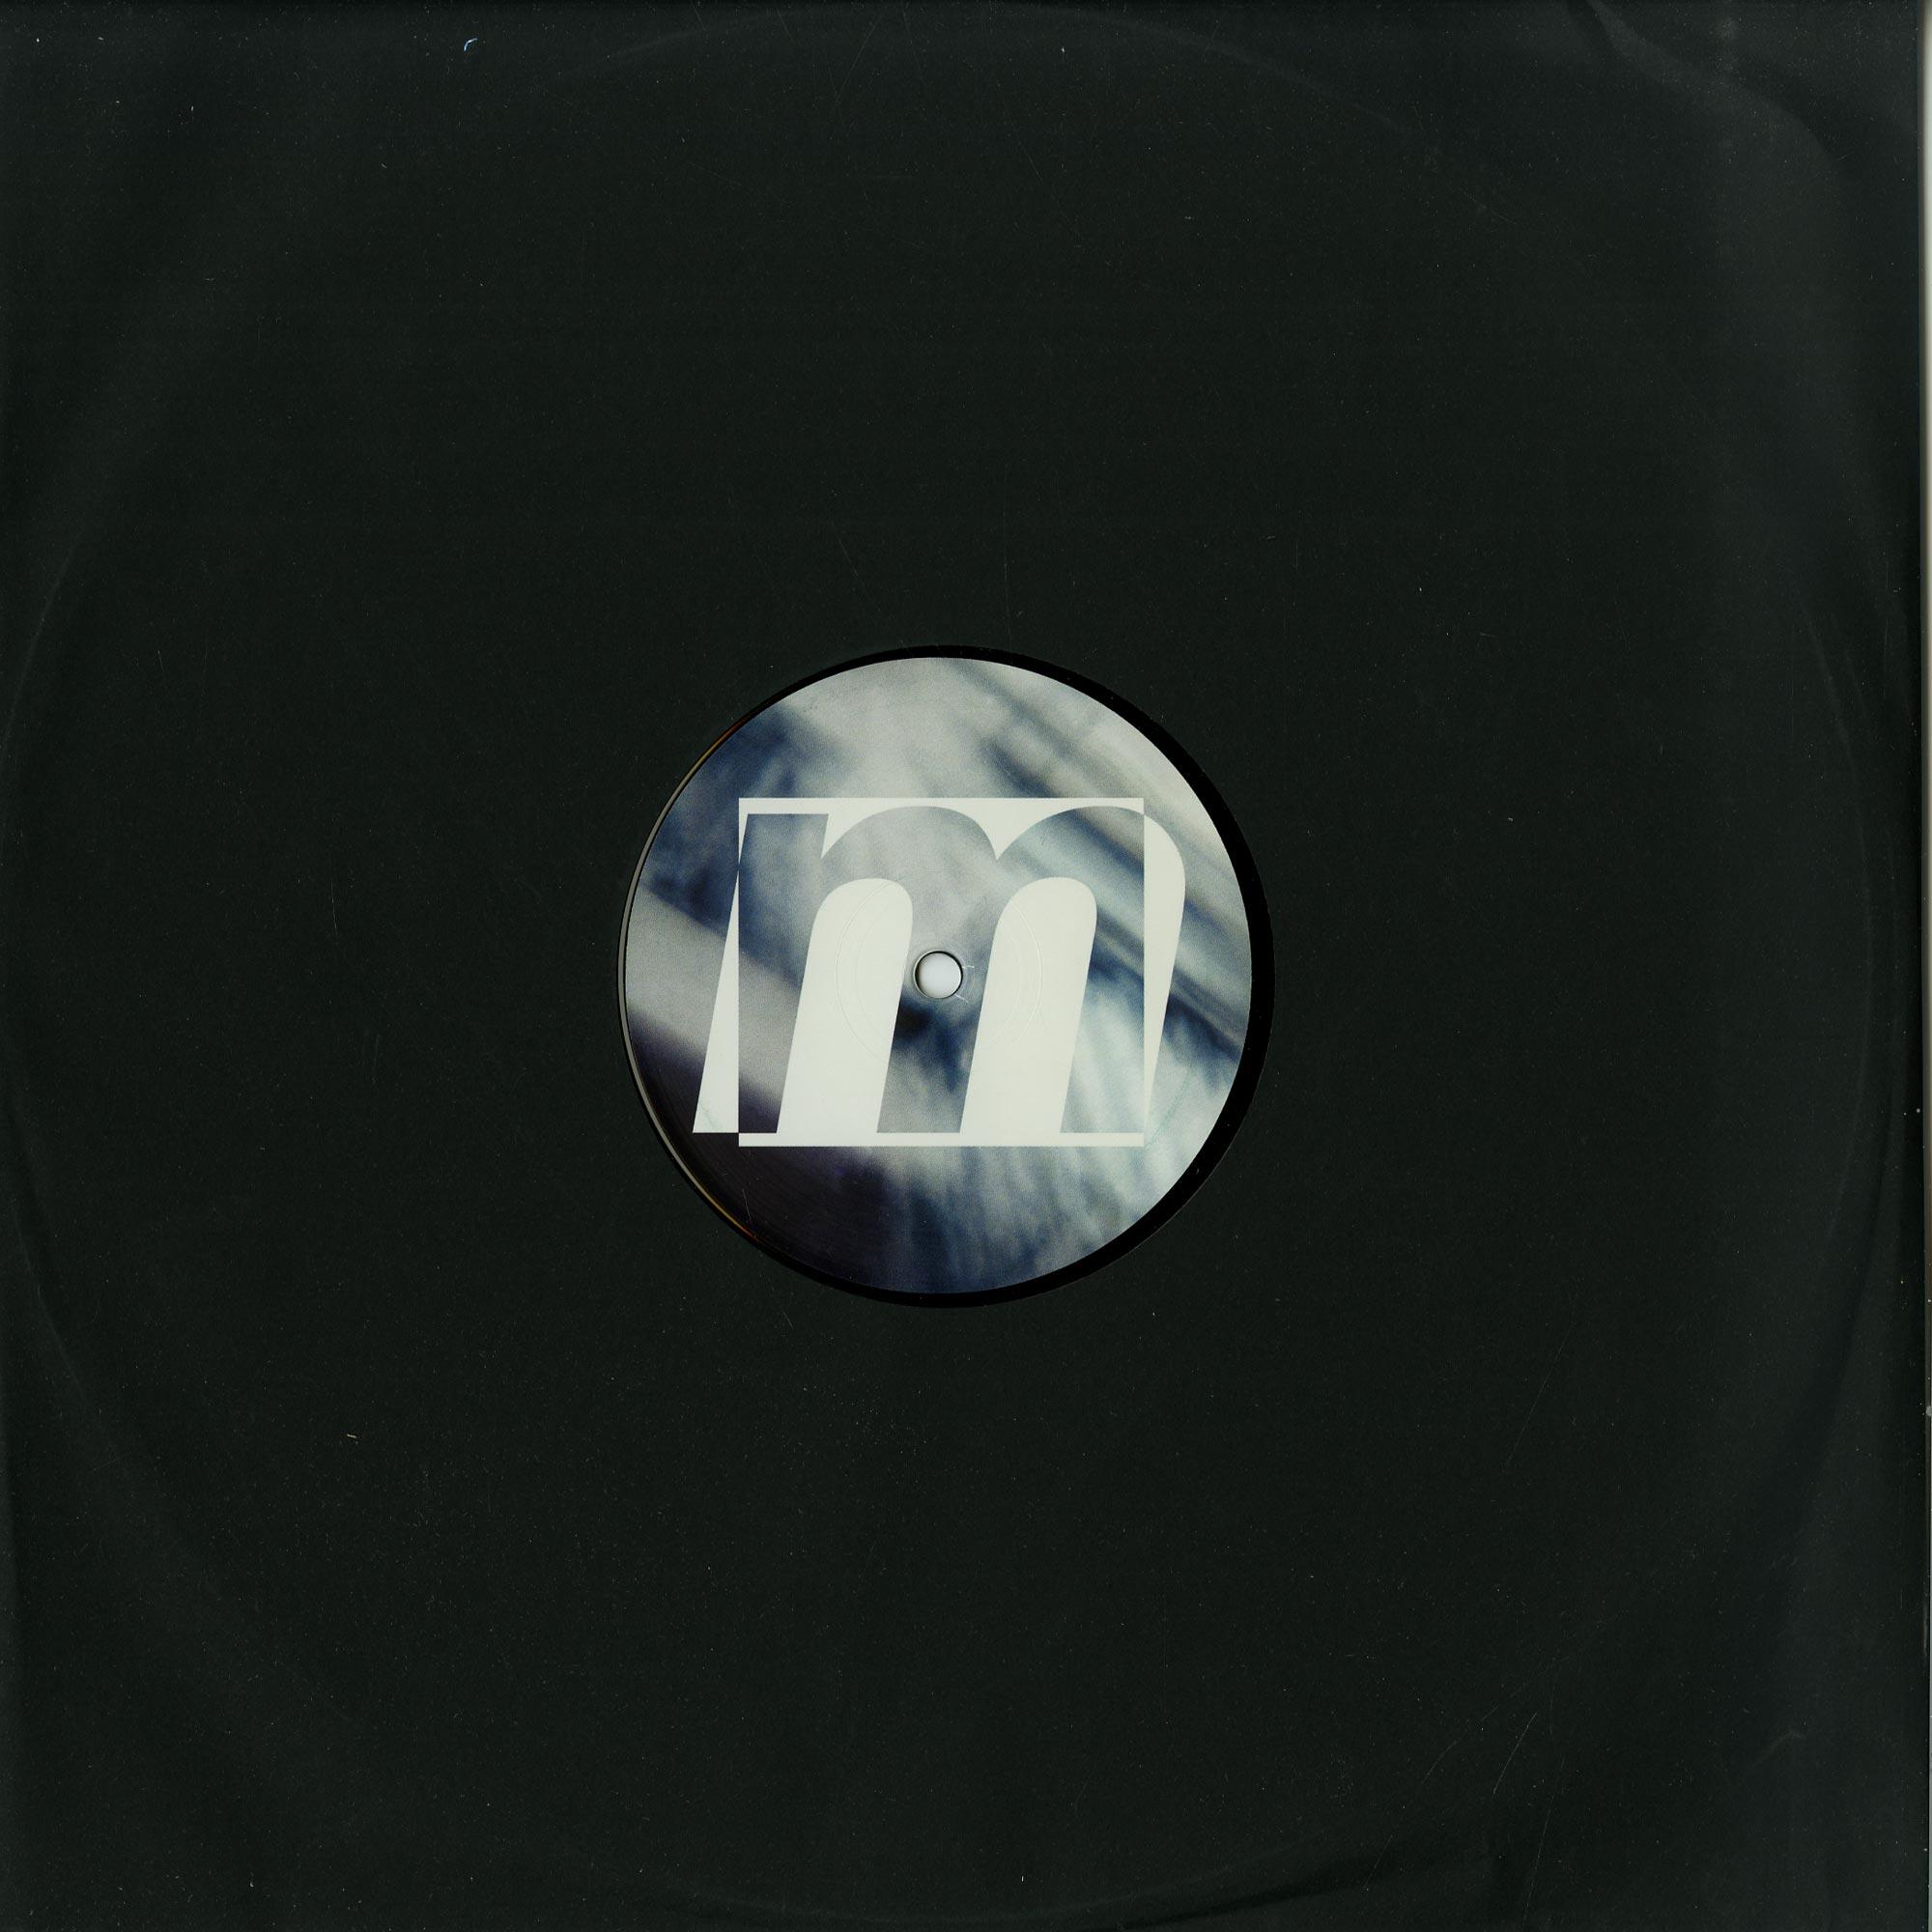 Estmode / Costy & Gerardo - NIGHT MATTERS EP